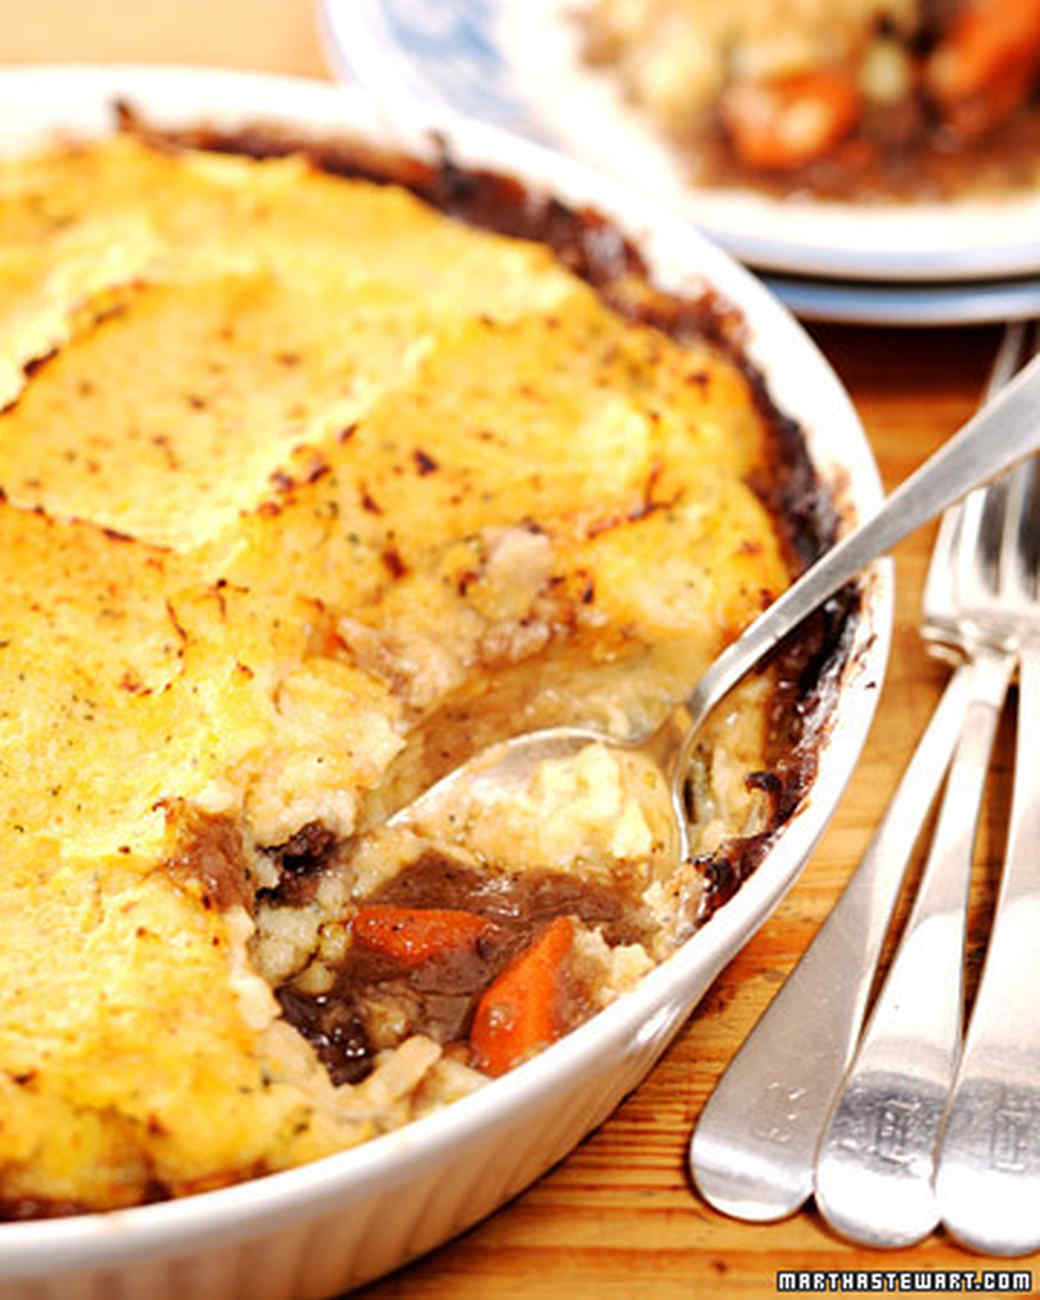 Shepherd's Pie with Rutabaga Topping